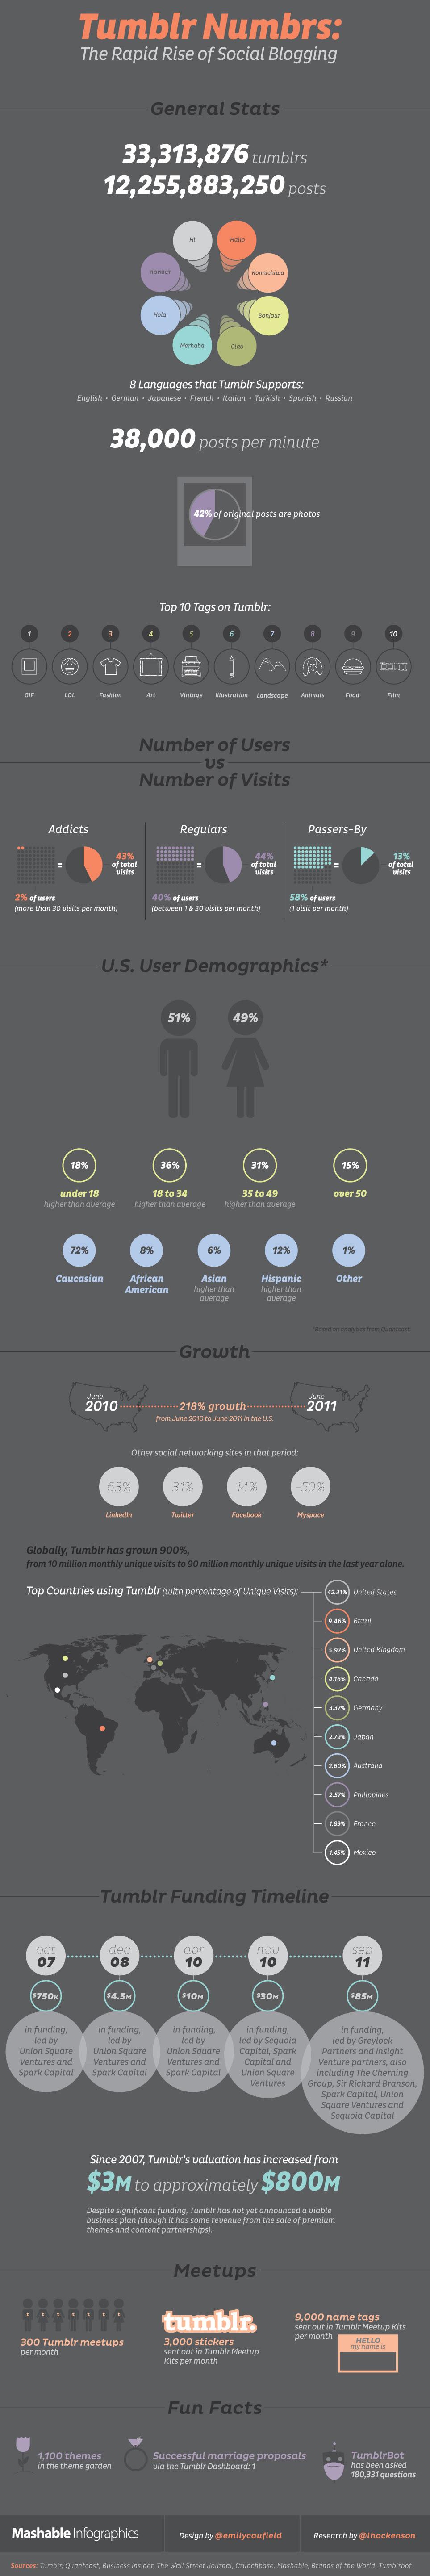 Tumblr the rapid rise of social blogging